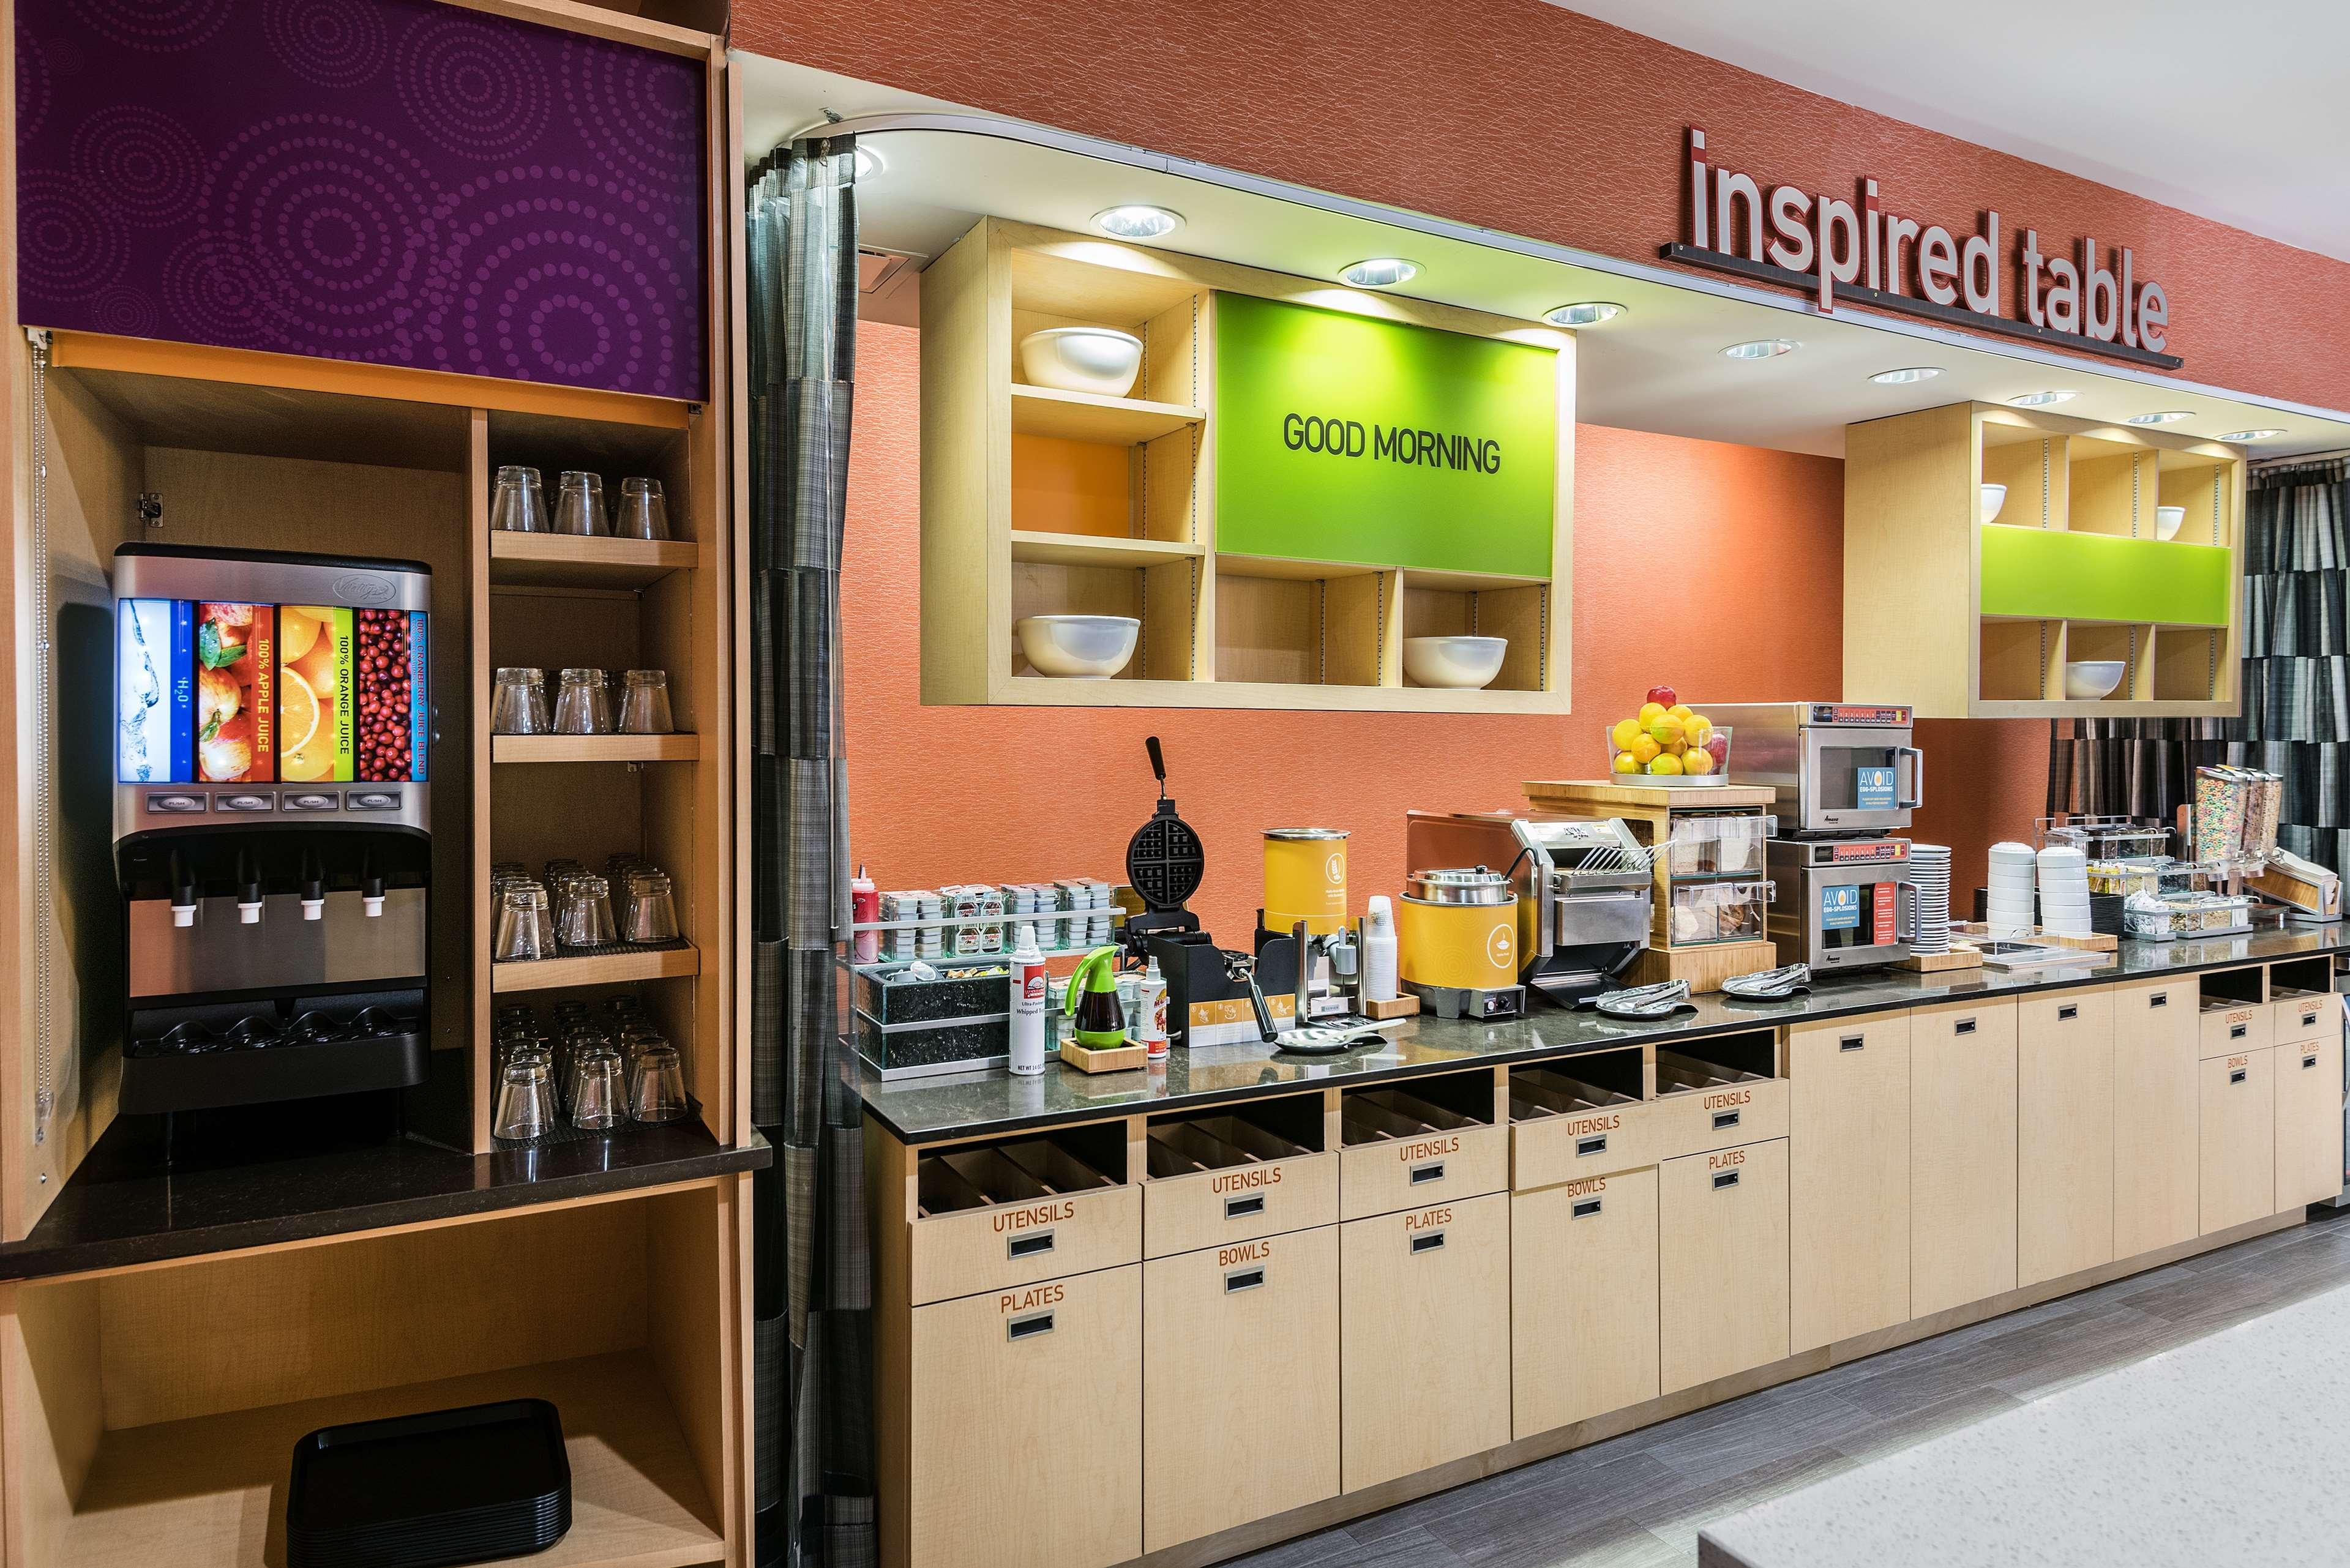 Home2 Suites by Hilton Austin Airport image 11